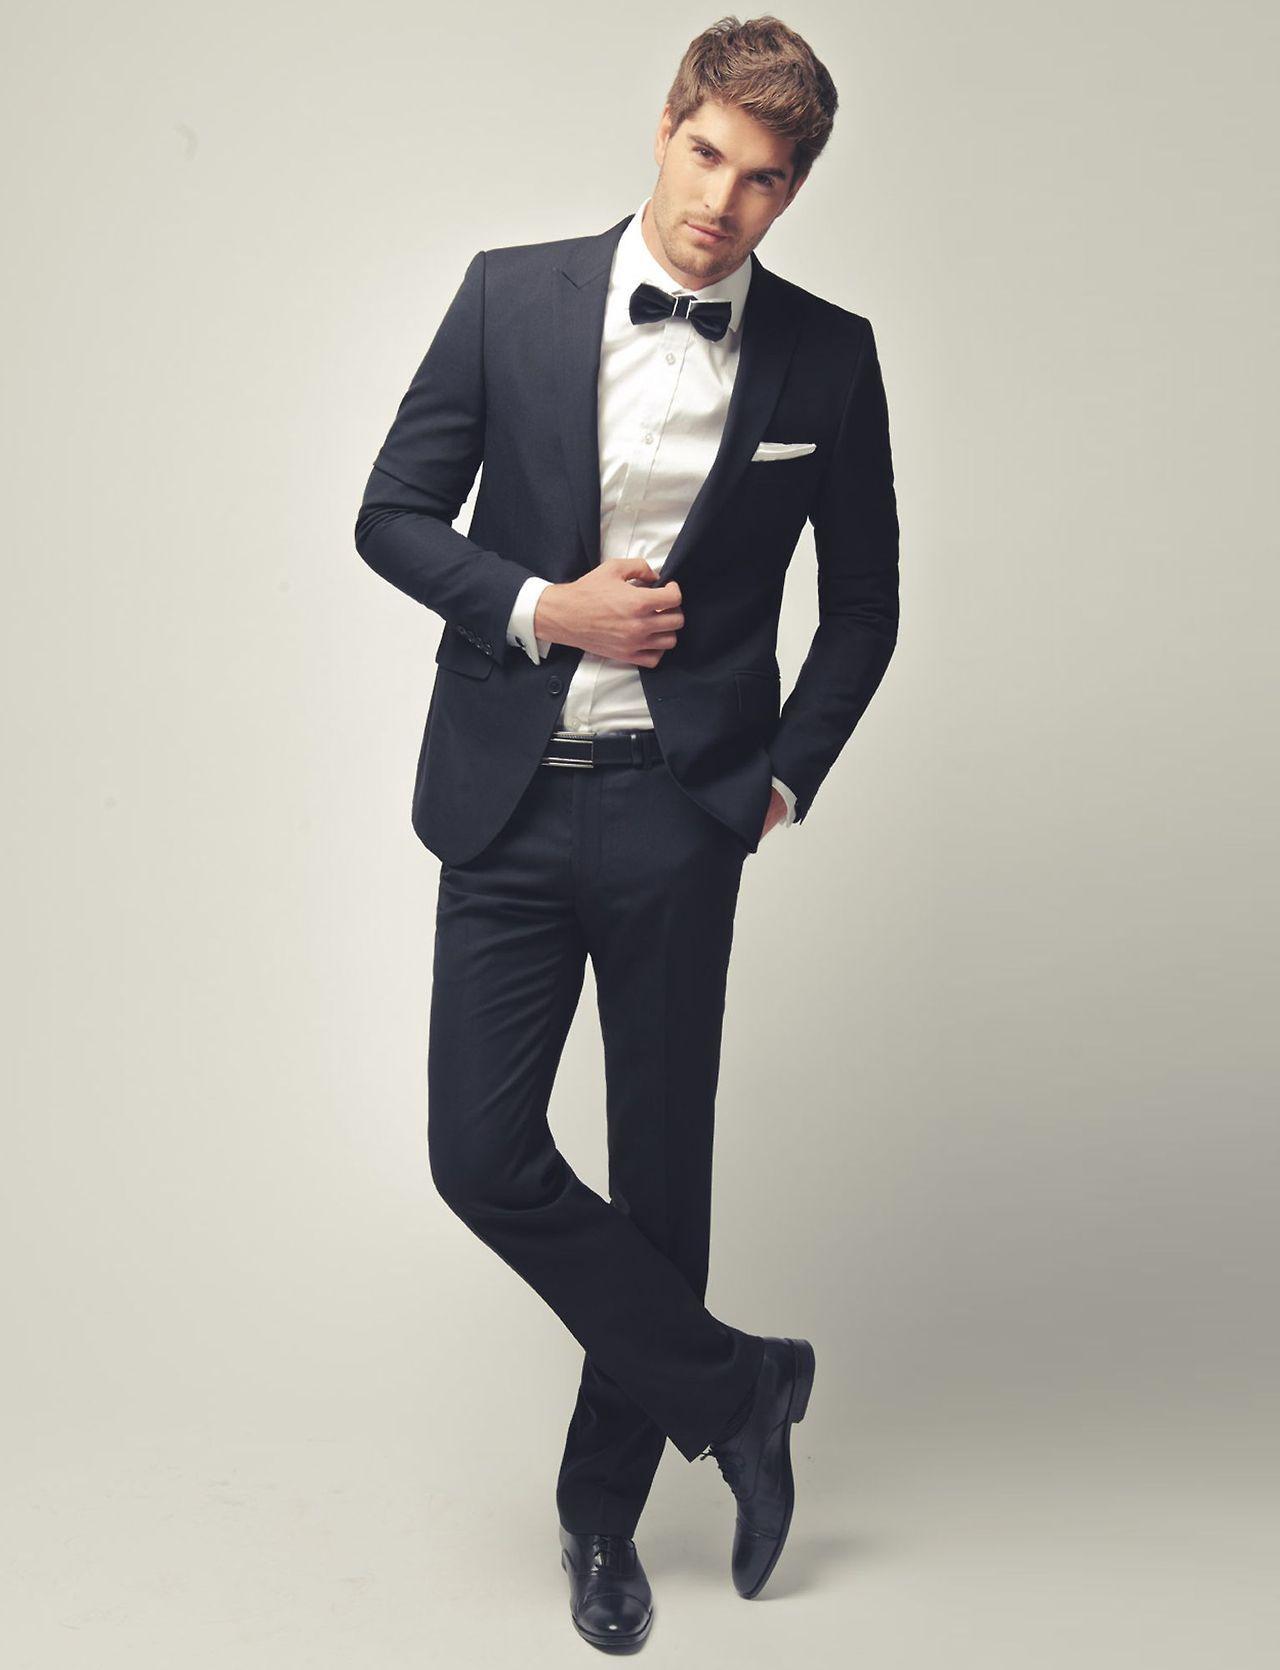 Nick Bateman. Bow tie